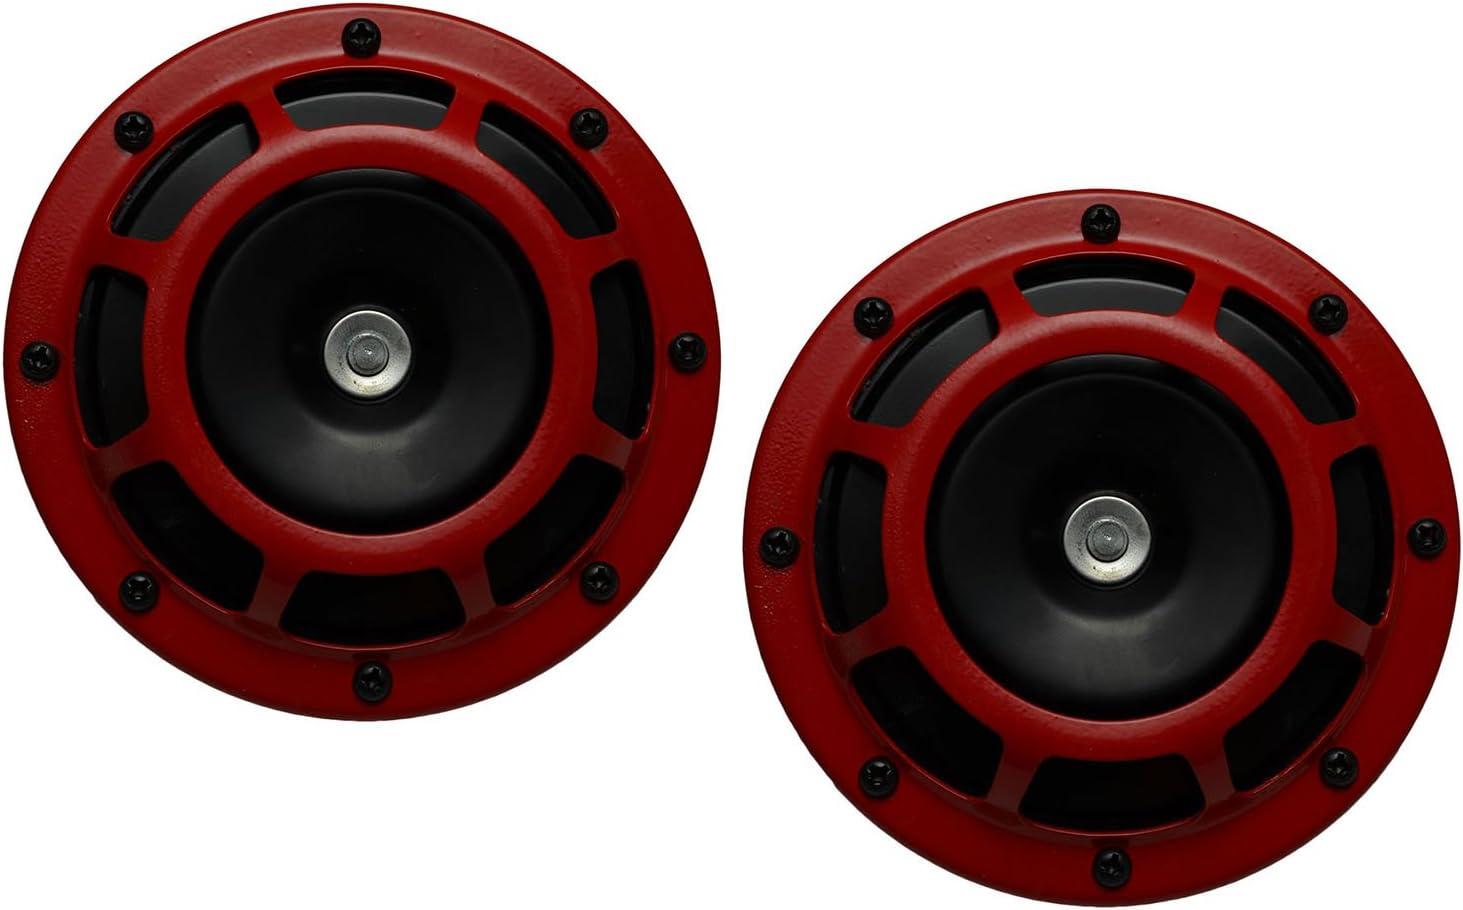 Sickspeed Blue Super Loud Single Electric Blast Tone Horn for Car//Truck//SUV 12V P1 for Hyundai Genesis